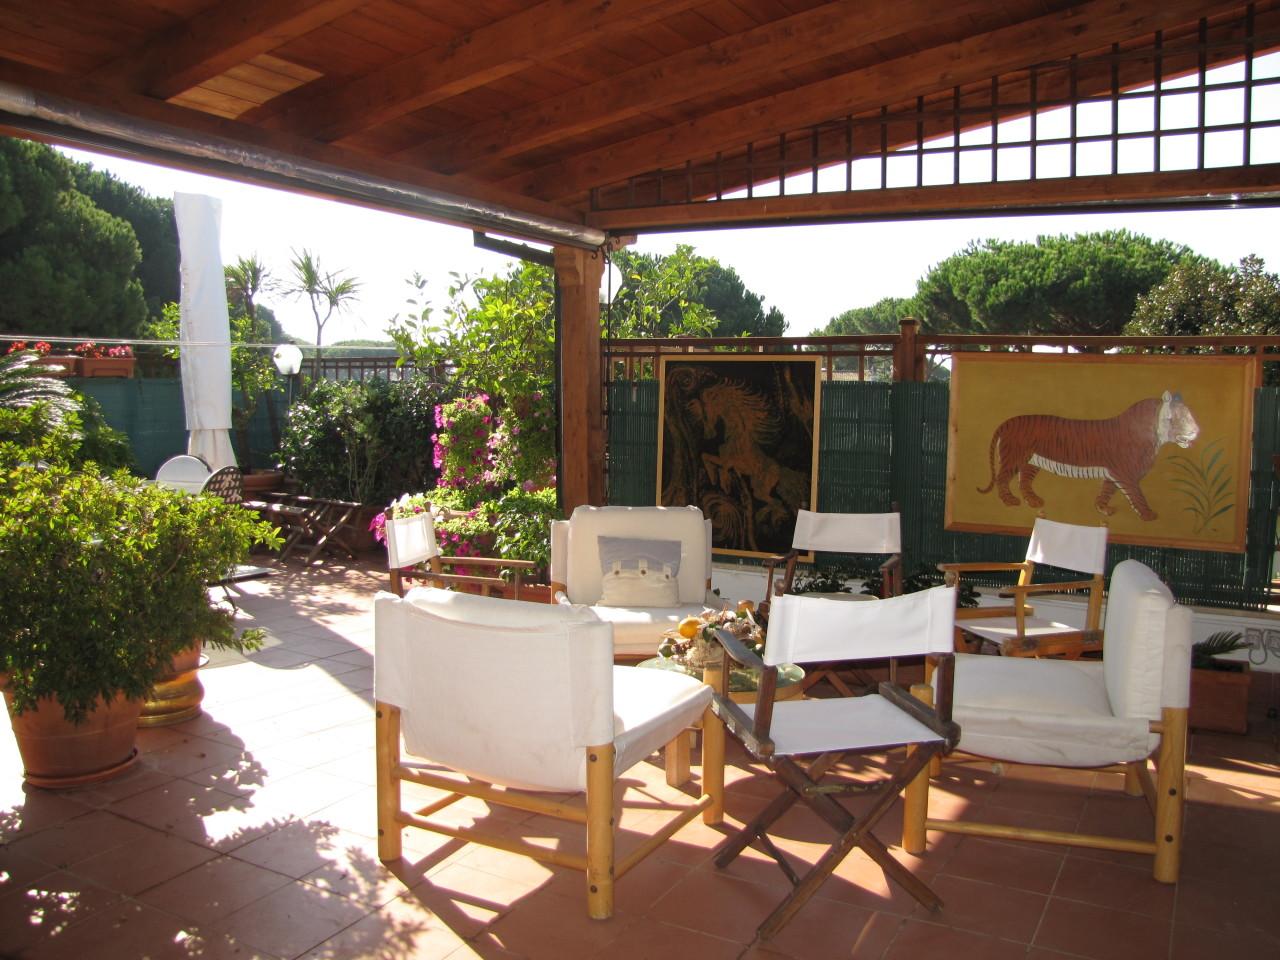 Appartamento - Attico a Residenziale, San Felice Circeo